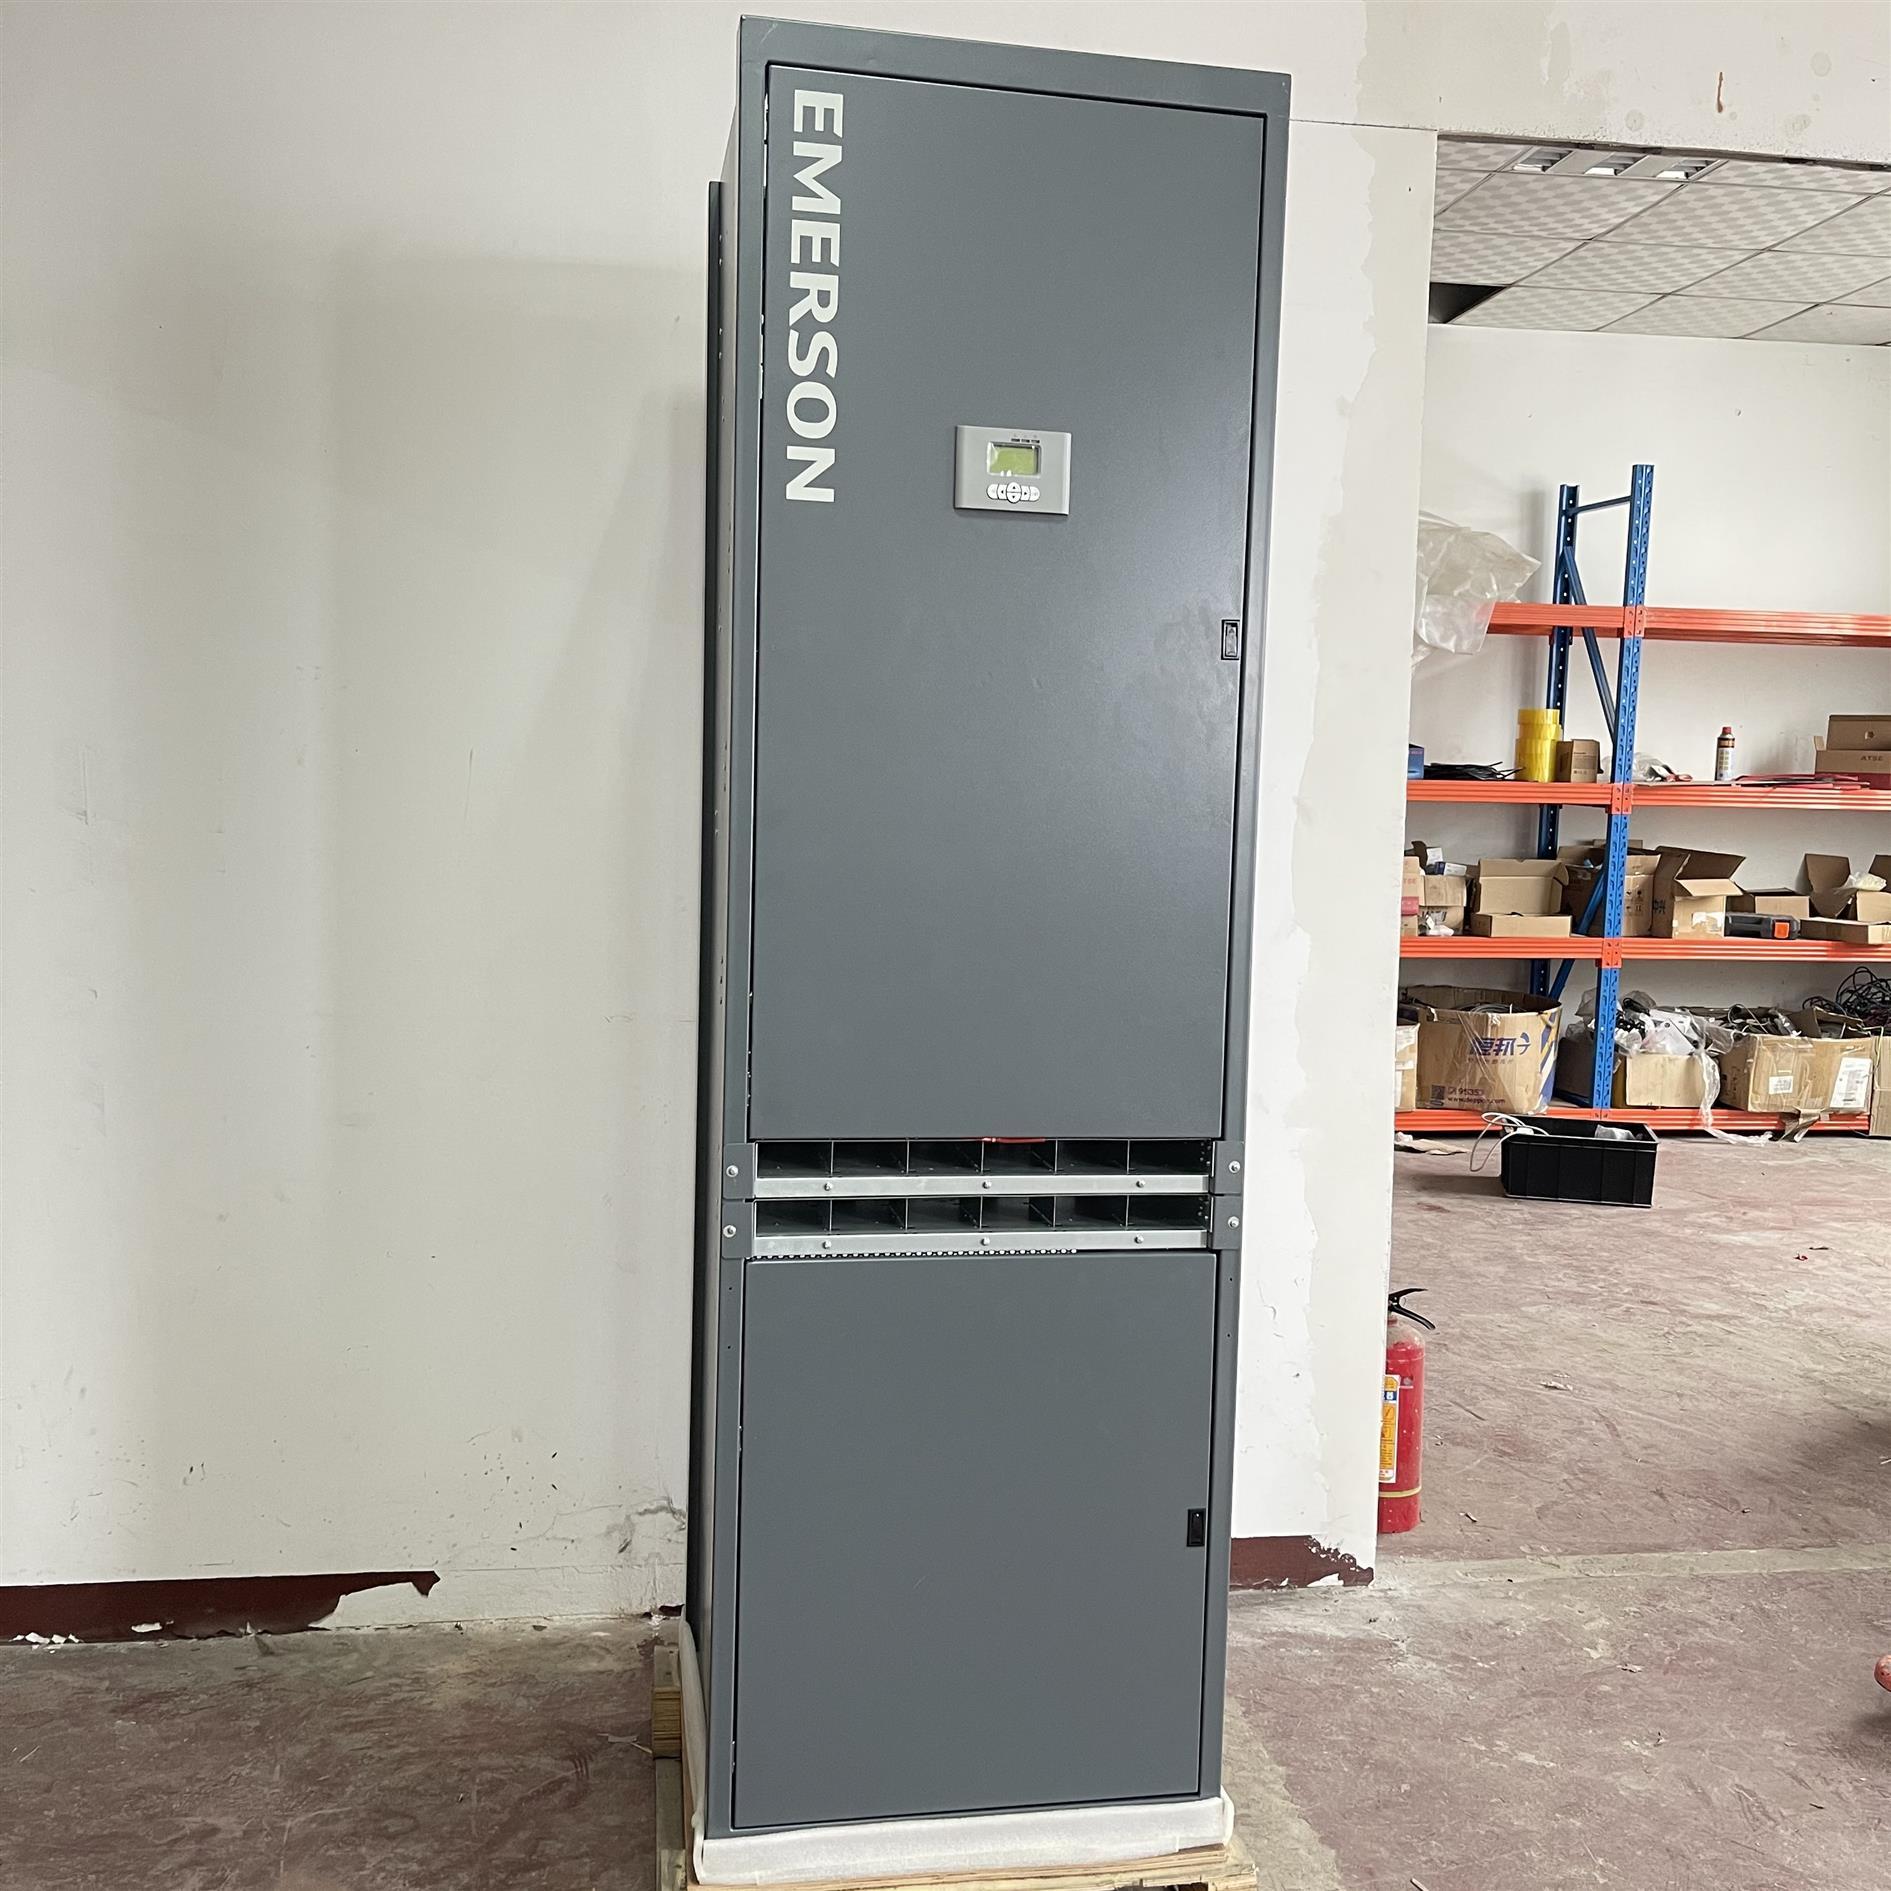 600A通信電源 長春艾默生NetSure731 CC2組合電源